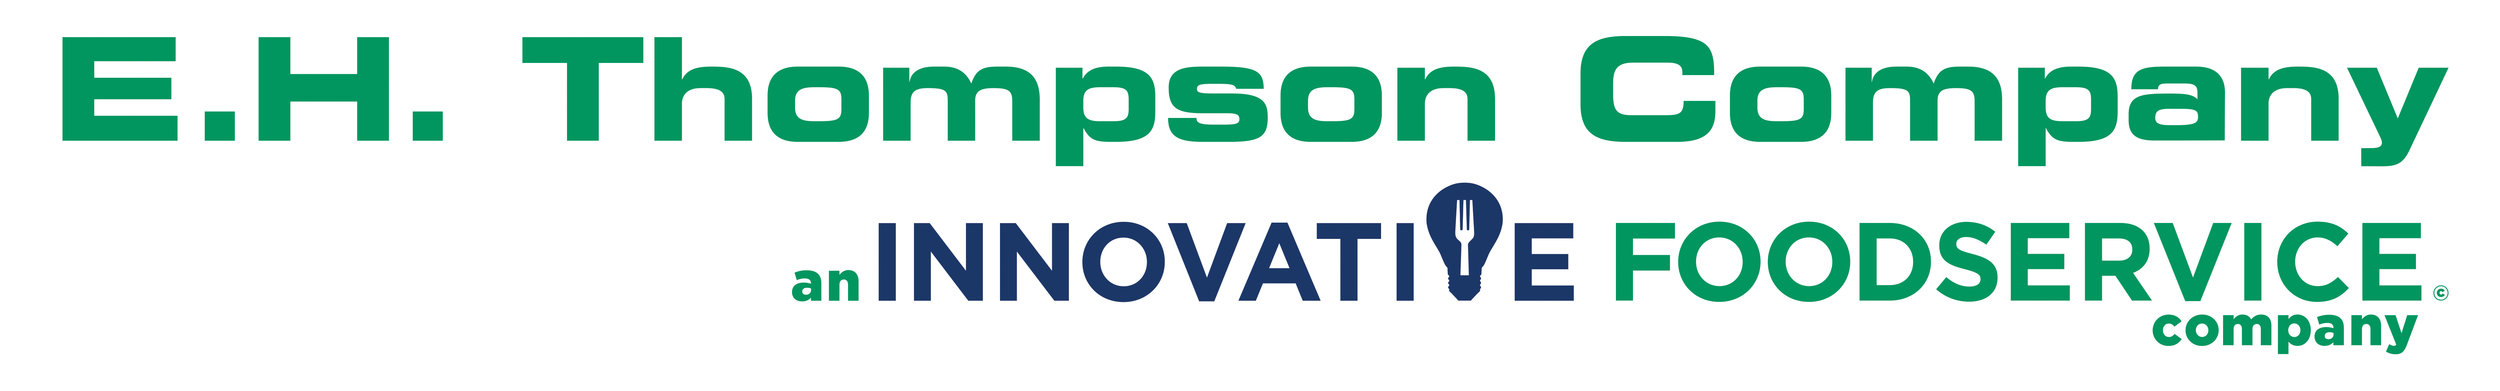 E.H. Thompson Company Logo